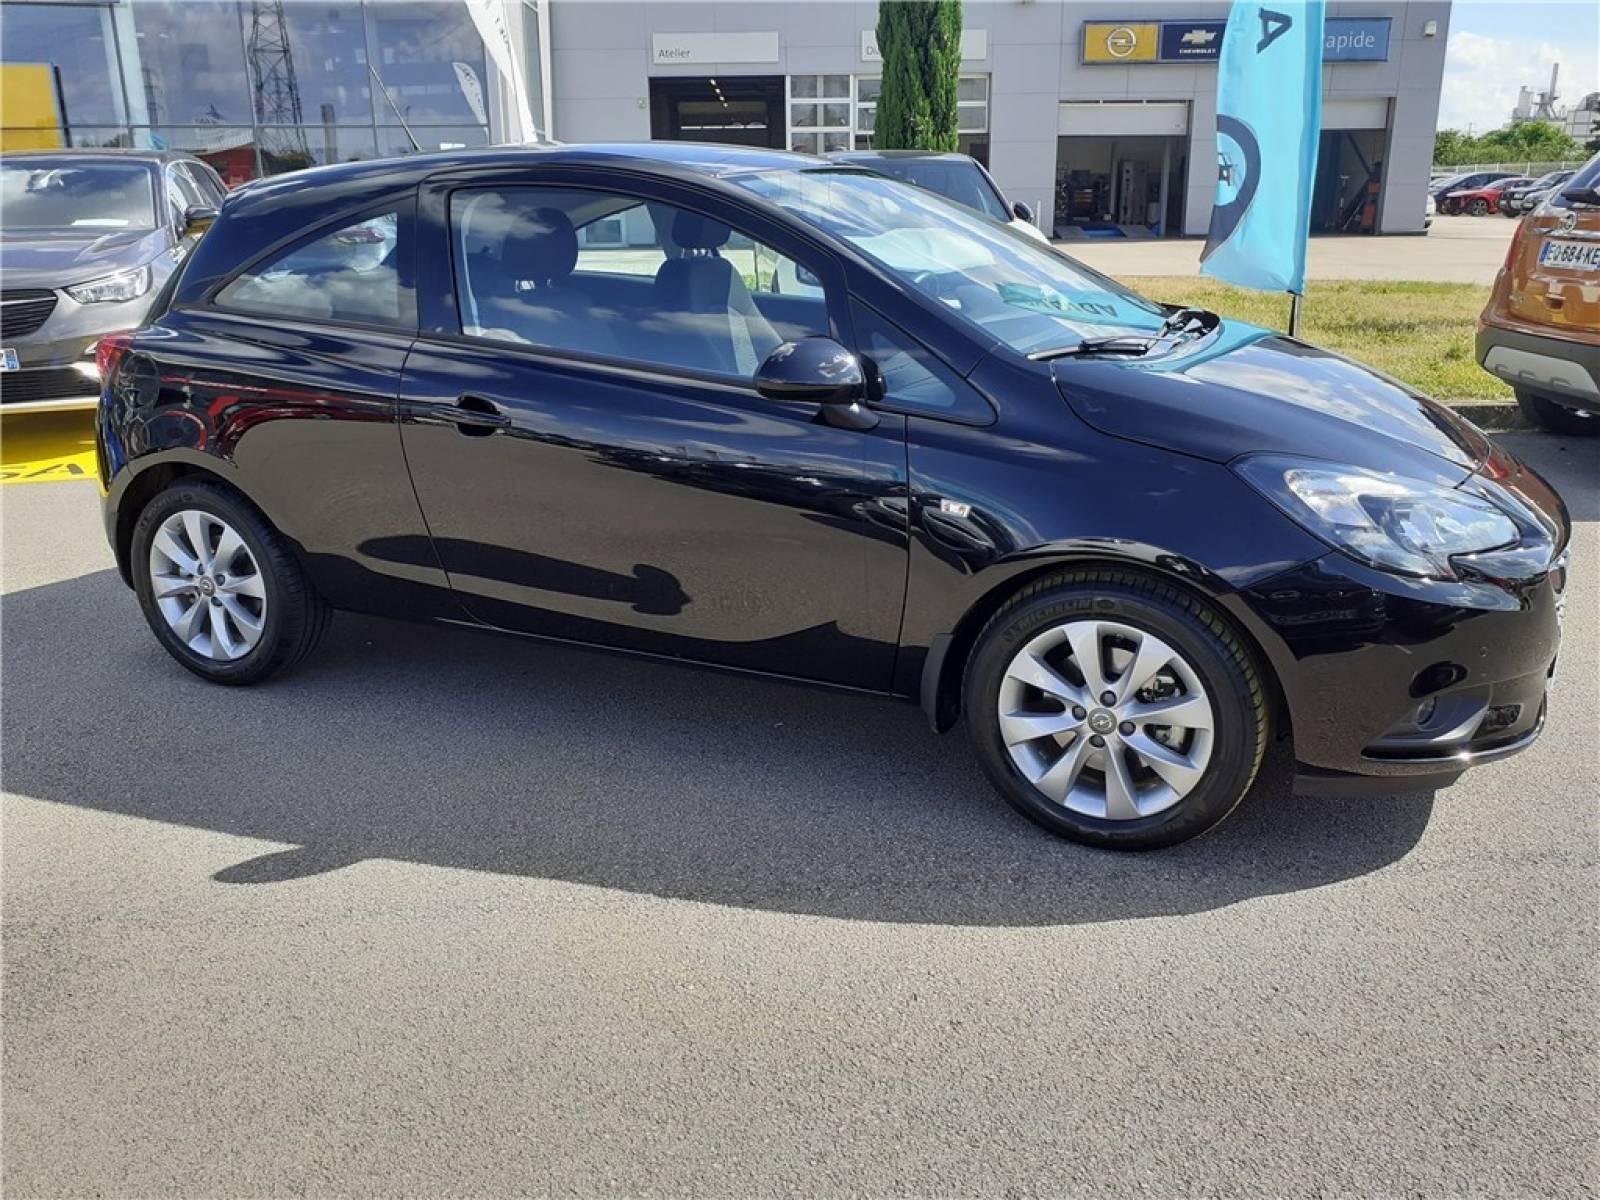 OPEL Corsa 1.4 Turbo 100 ch - véhicule d'occasion - Groupe Guillet - Opel Magicauto - Chalon-sur-Saône - 71380 - Saint-Marcel - 2